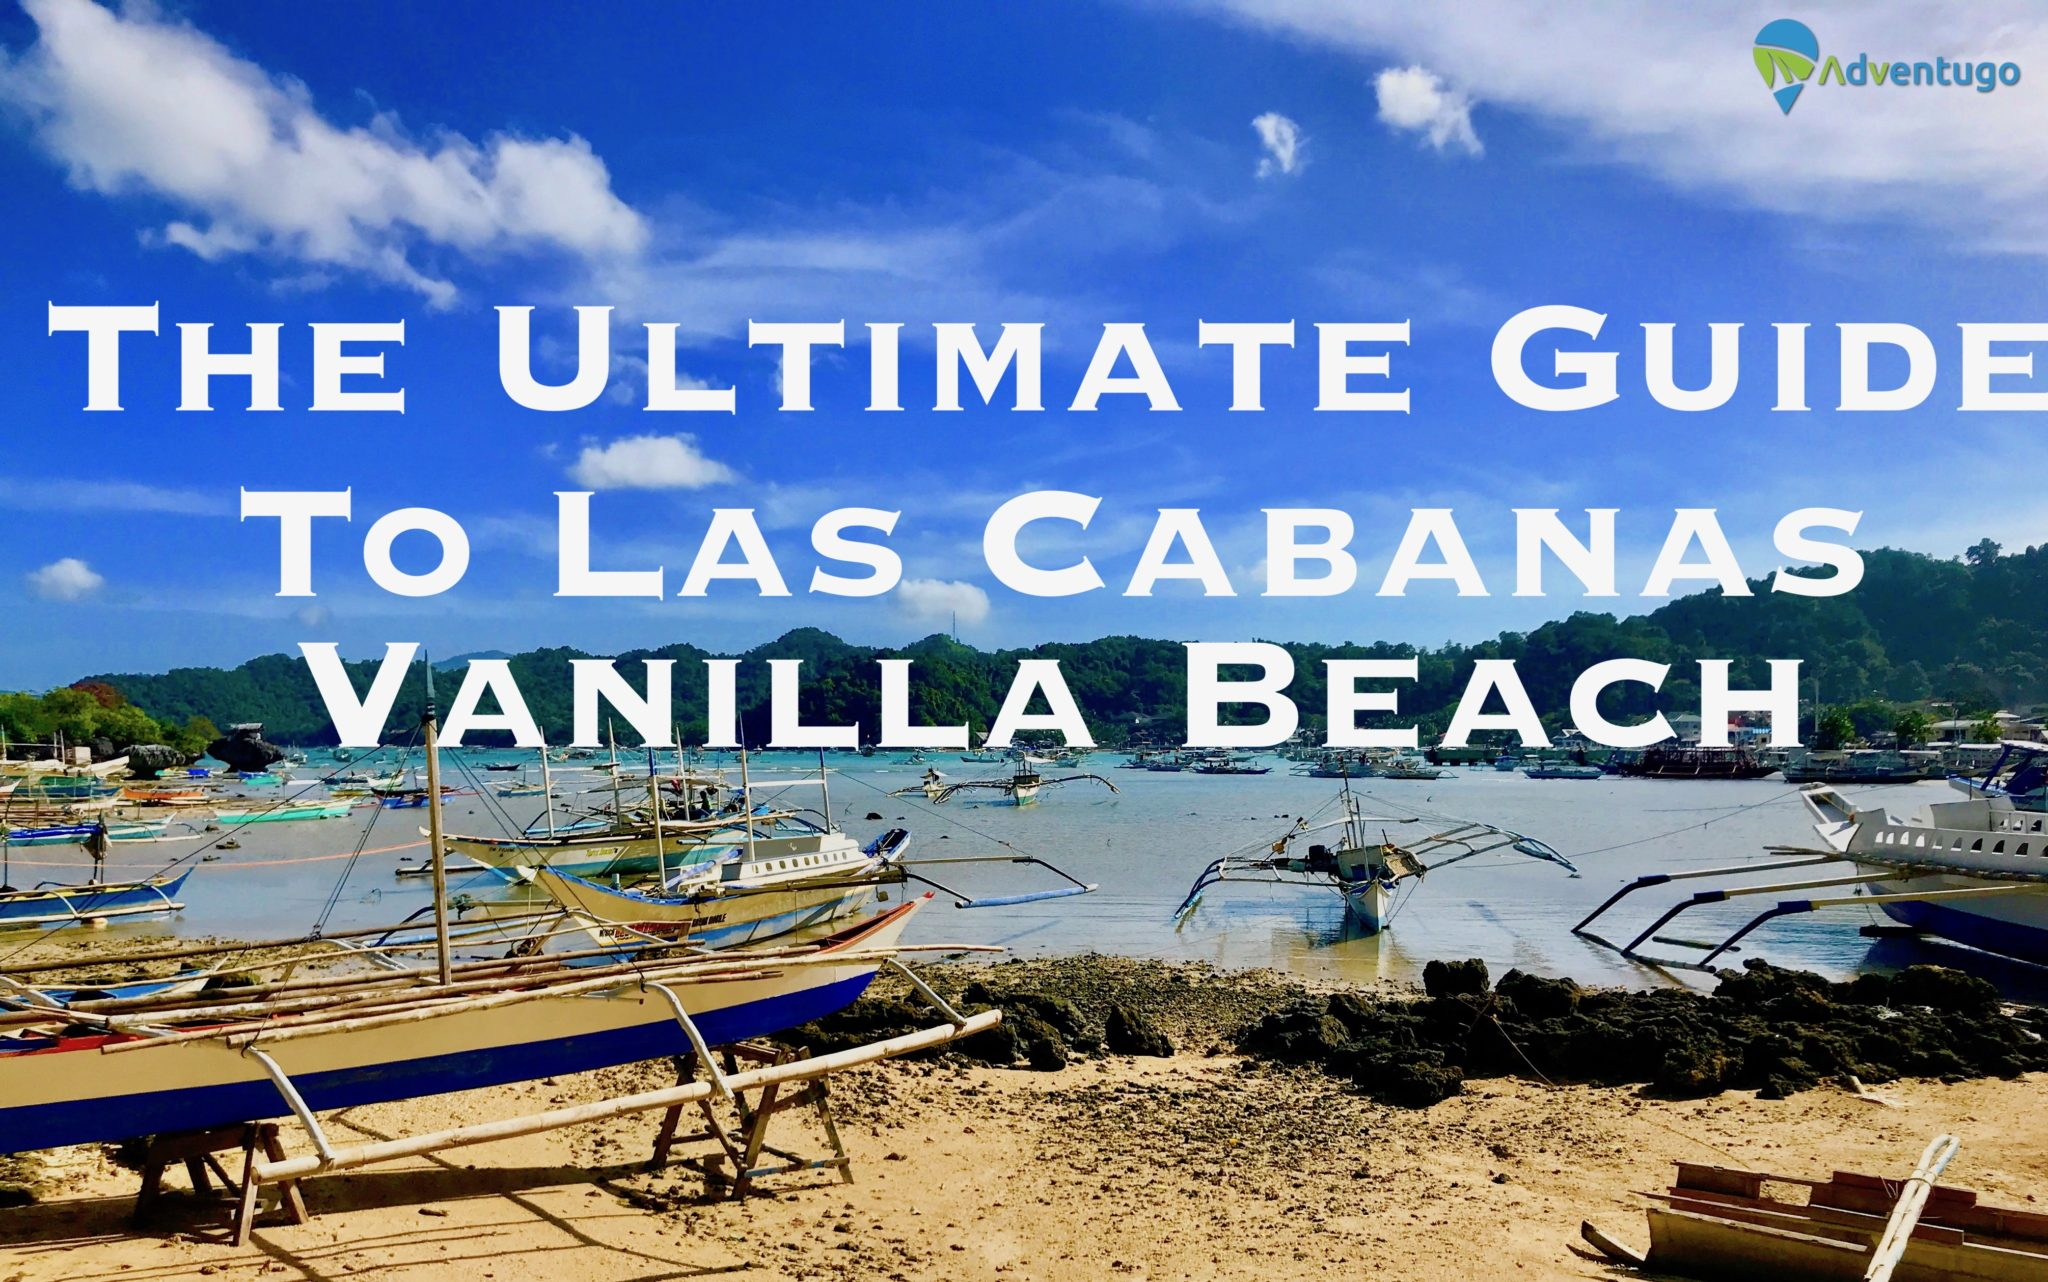 The Ultimate Guide to Las Cabanas Beach, Vanilla Beach and Carong Carong Beach El Nido, Palawan. Philippines Beaches